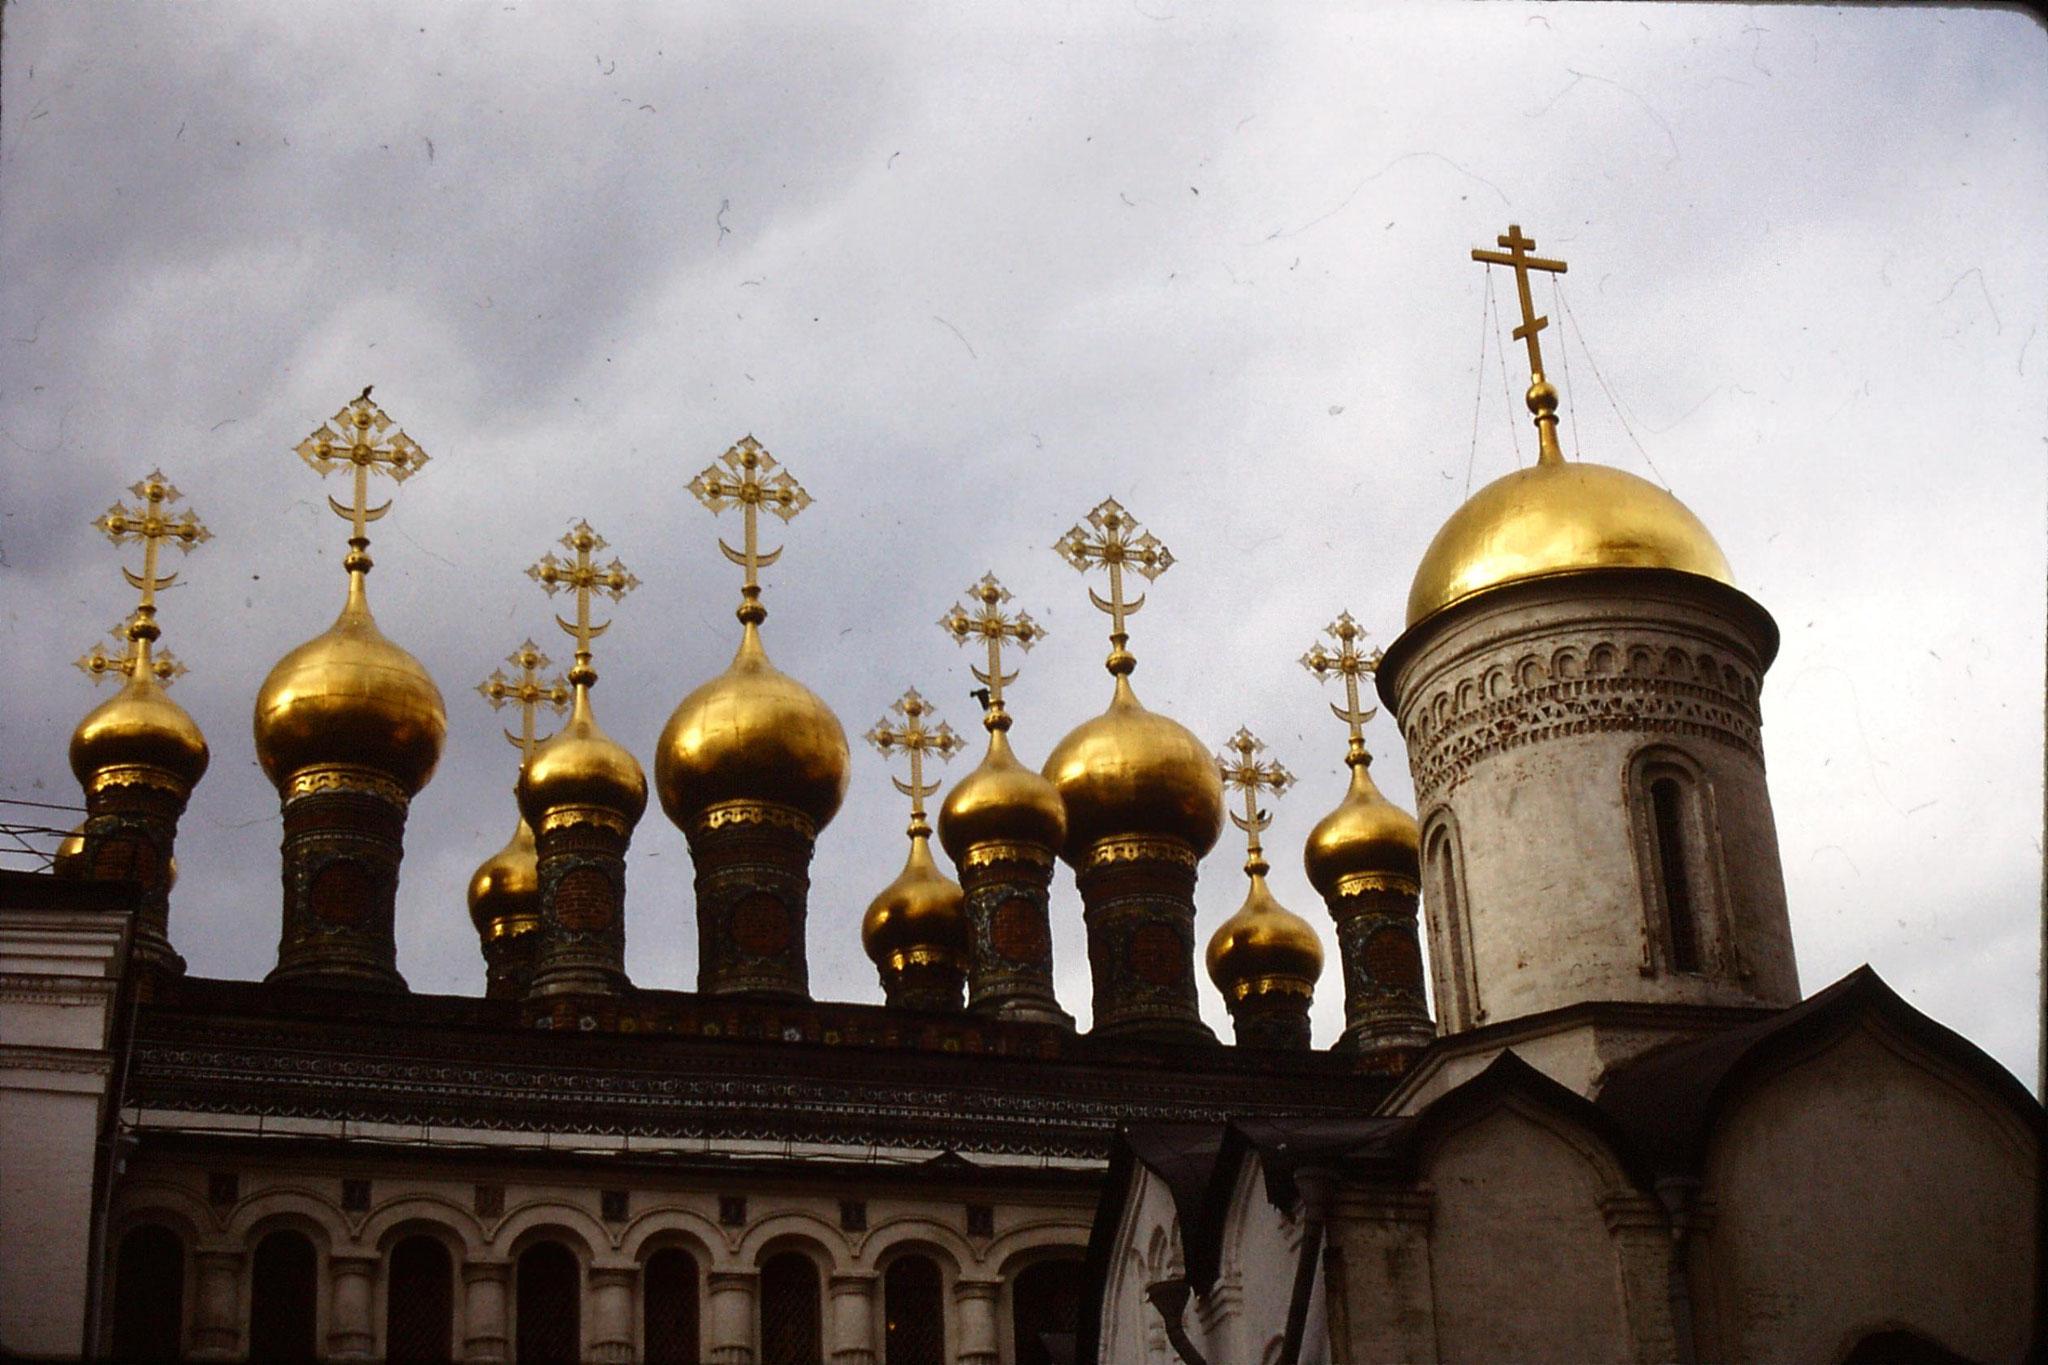 17/10/1988: 4: Kremlin Domes of Verkospasky Cathedral